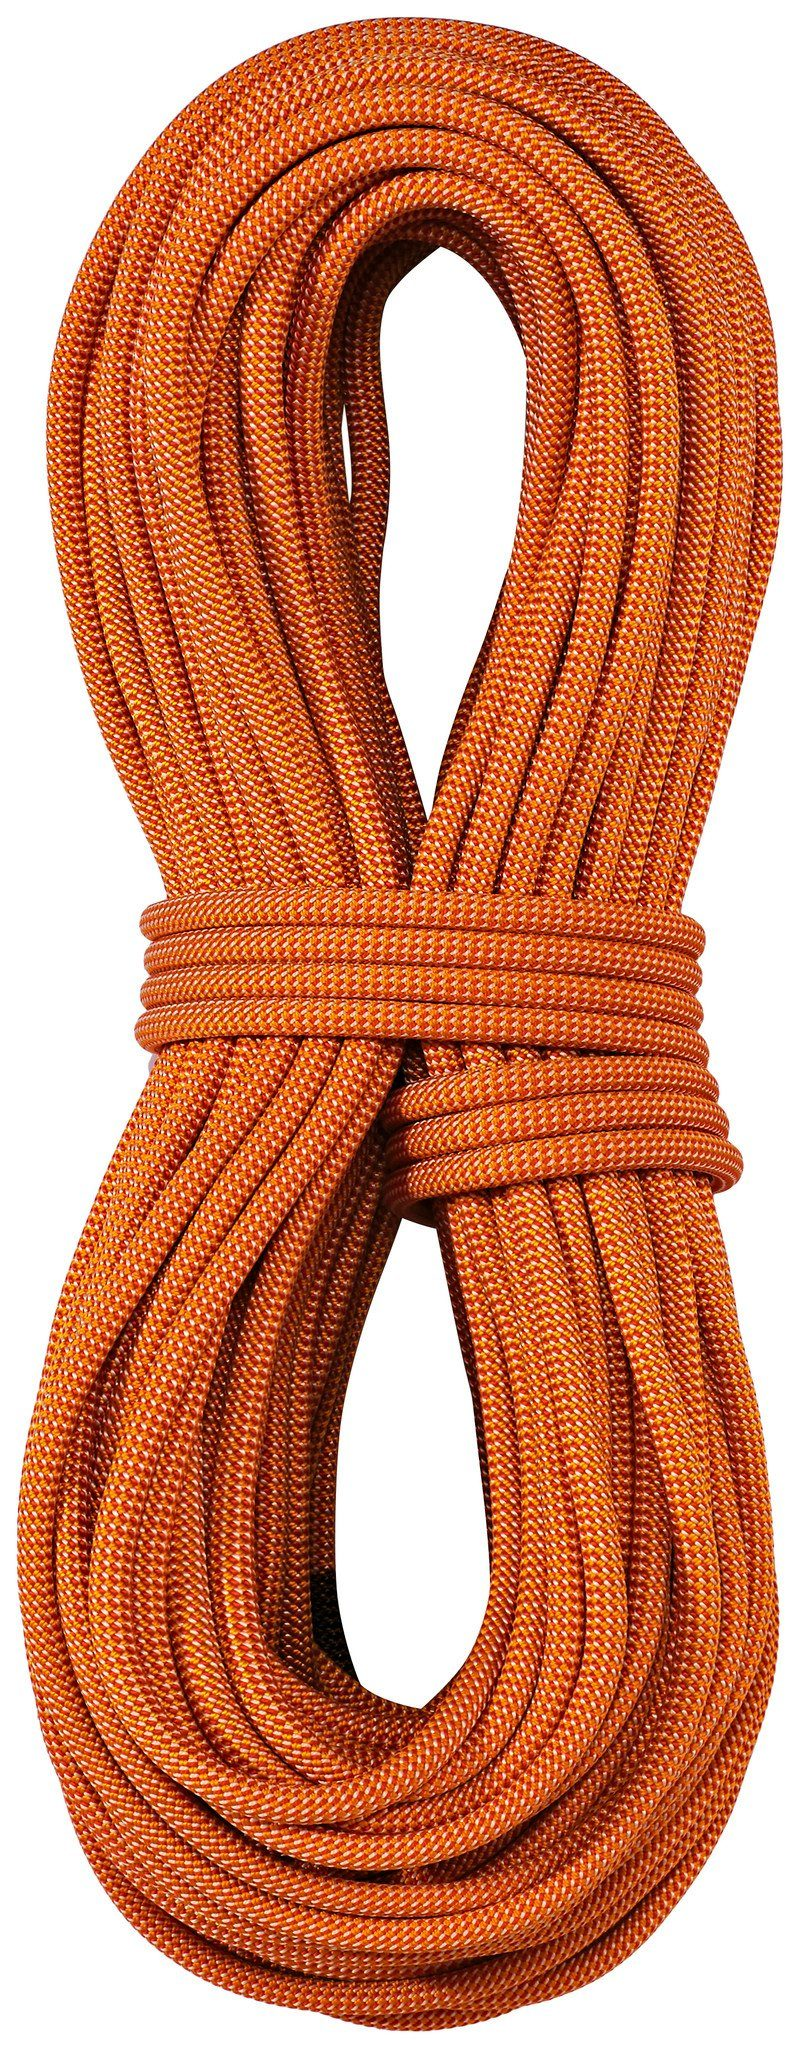 Edelrid Kletterseil »Heron Pro Dry Rope 9,8mm 70m«